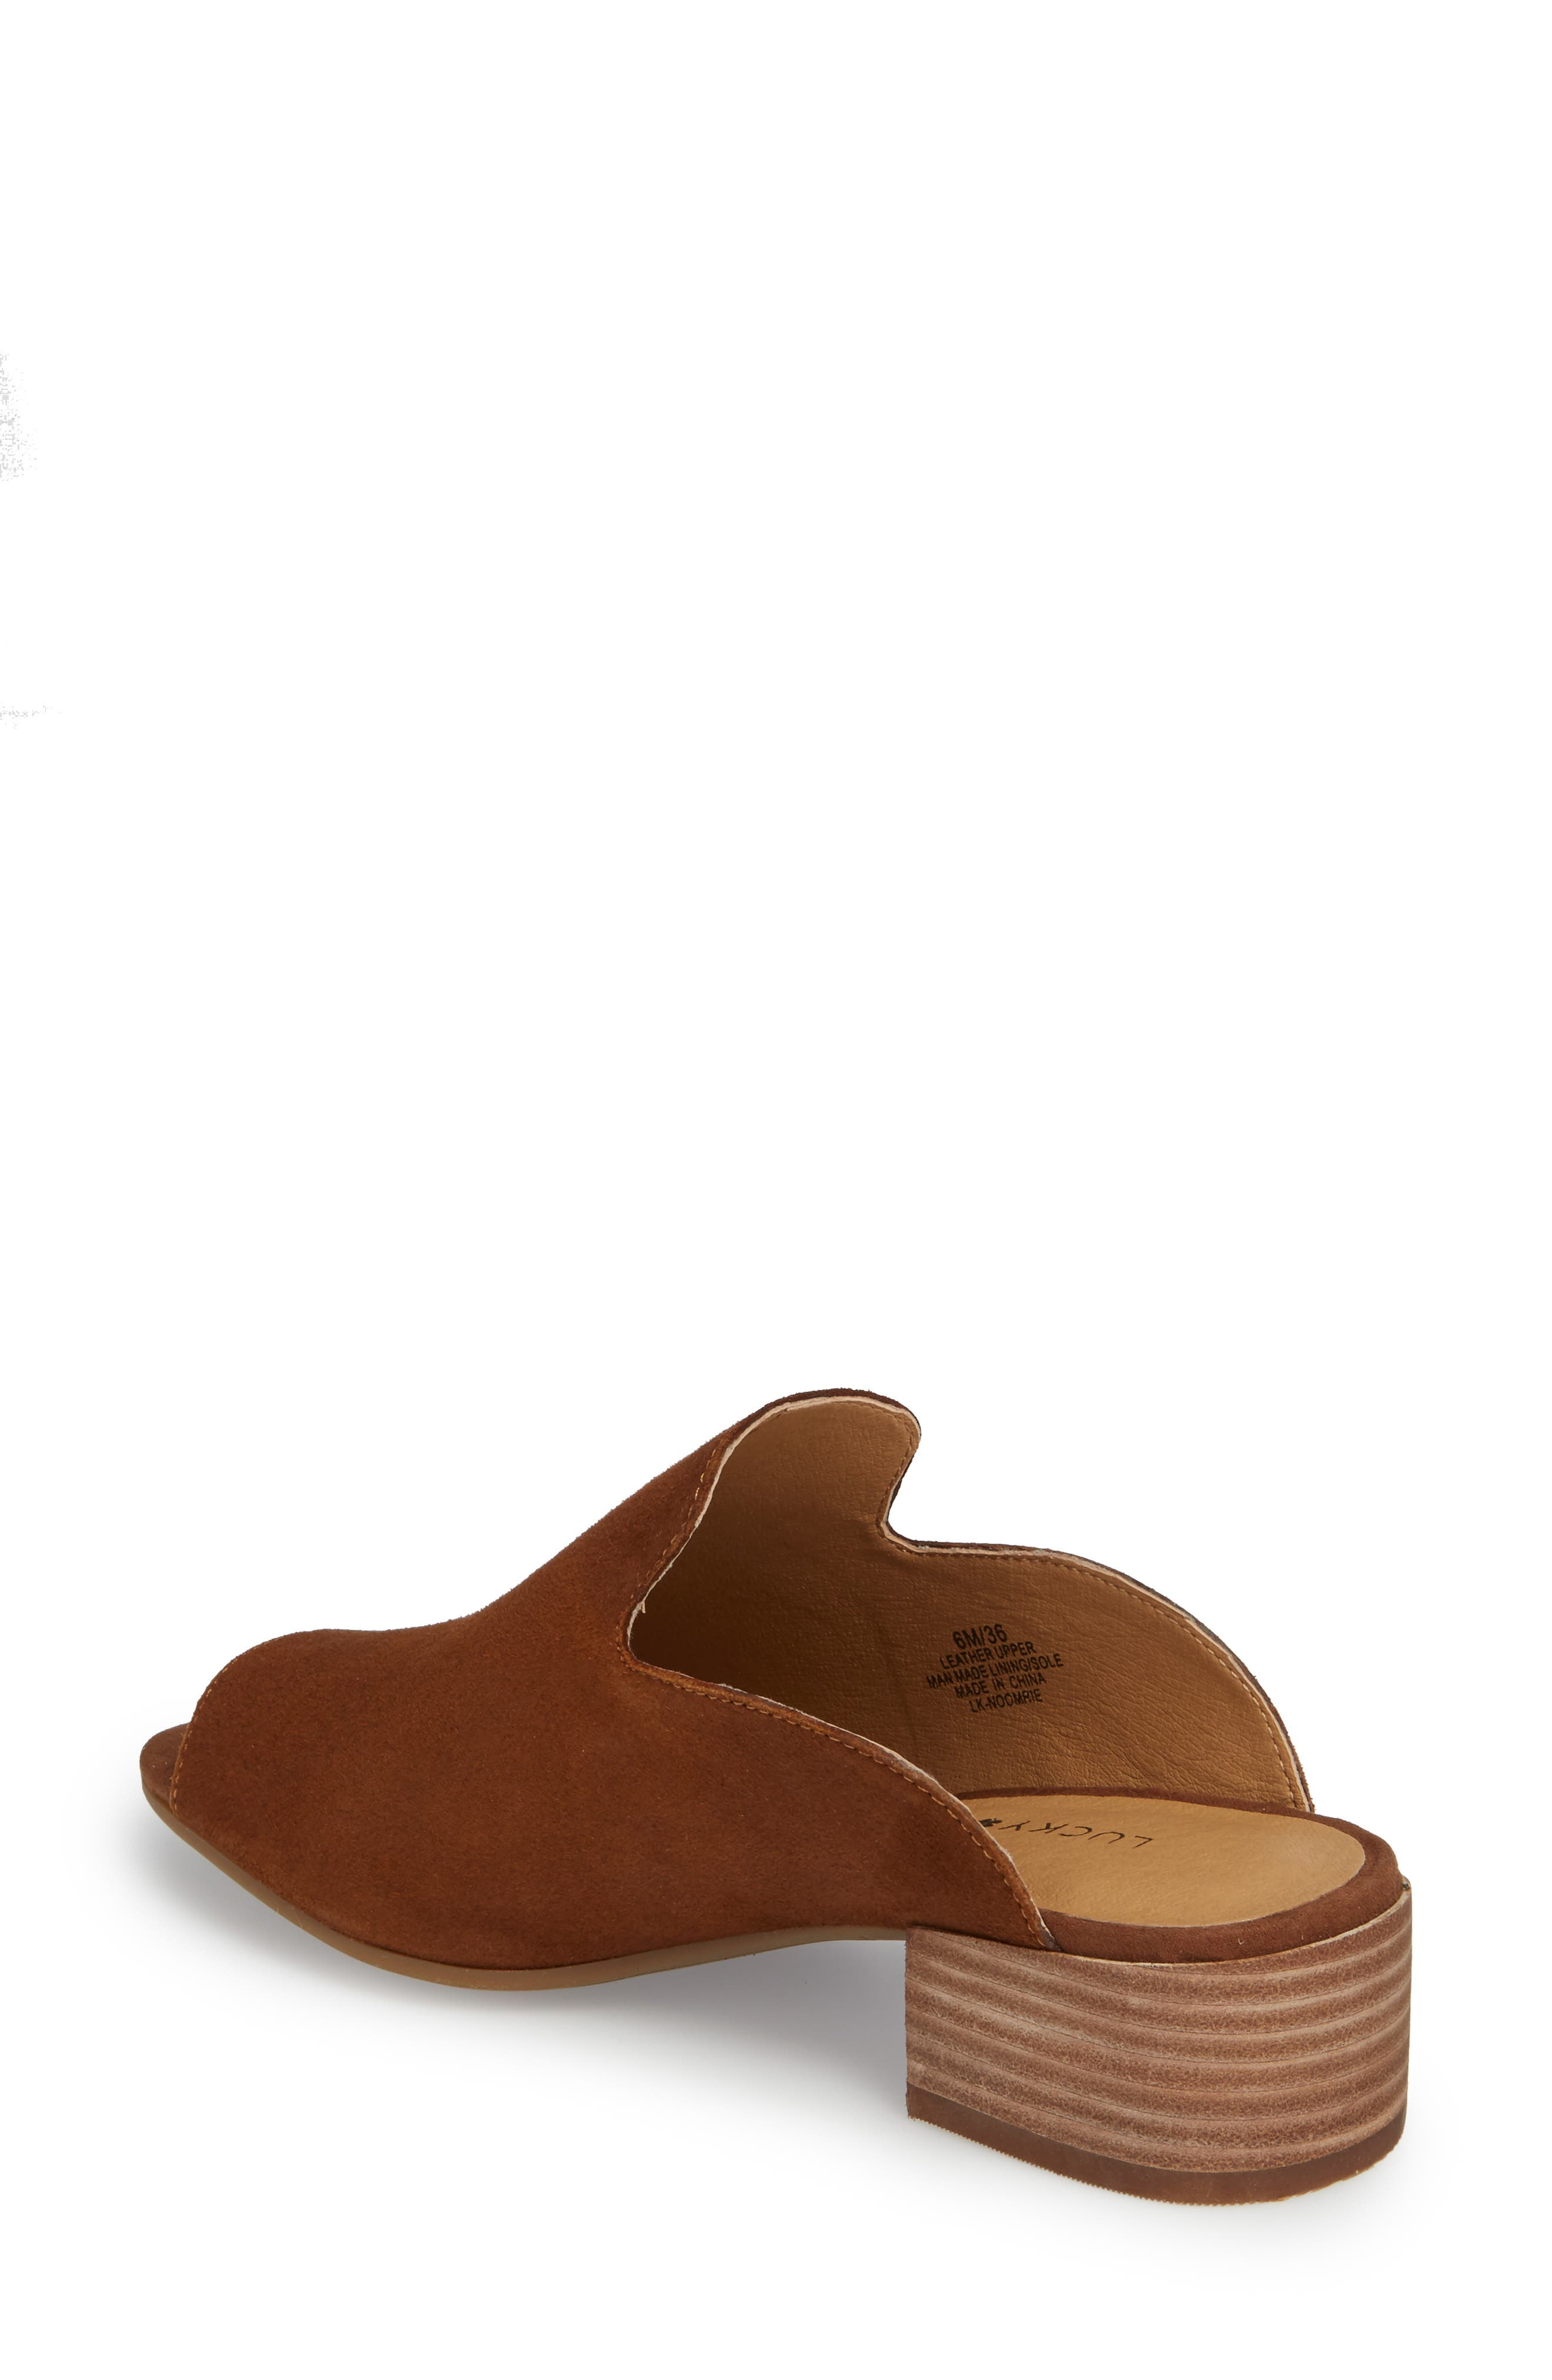 Noomrie Sandal,                             Alternate thumbnail 2, color,                             Cedar Leather